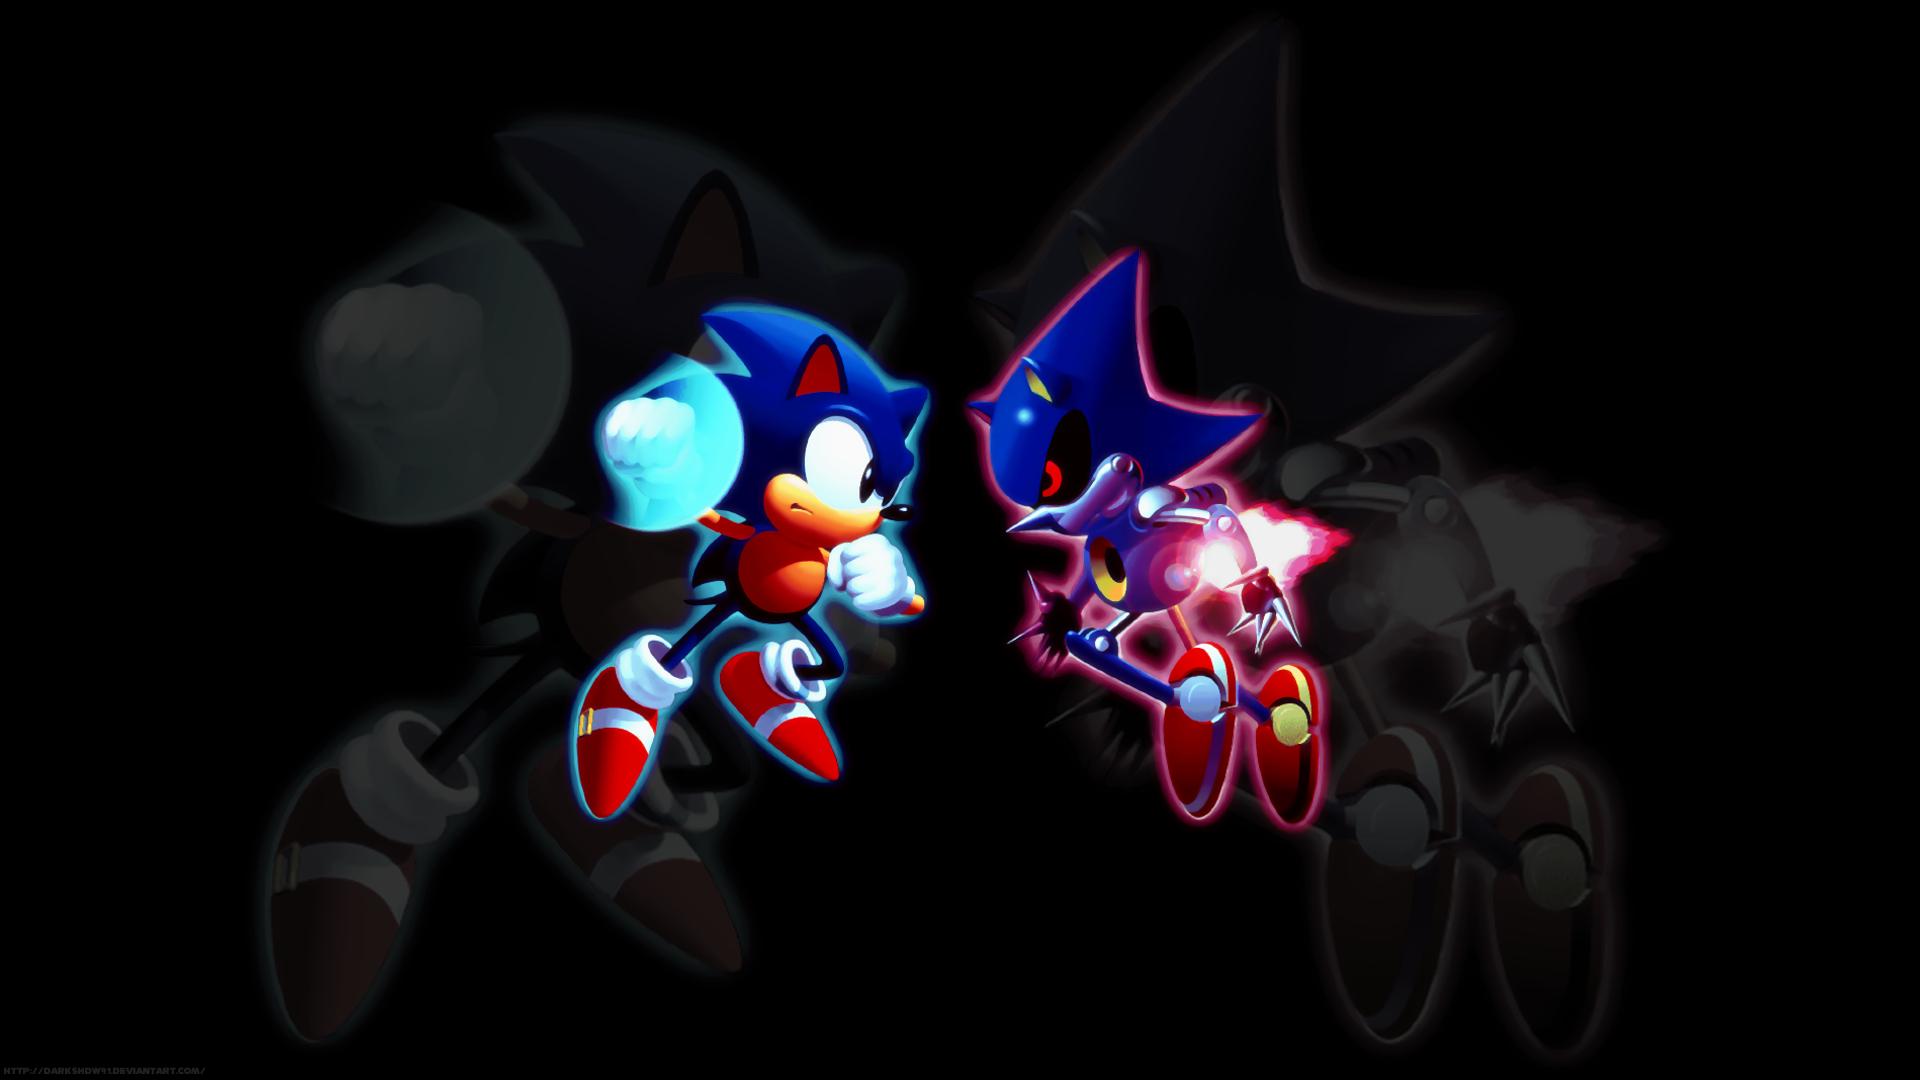 Sonic Vs Metal Sonic By Darkshdw91 On Deviantart